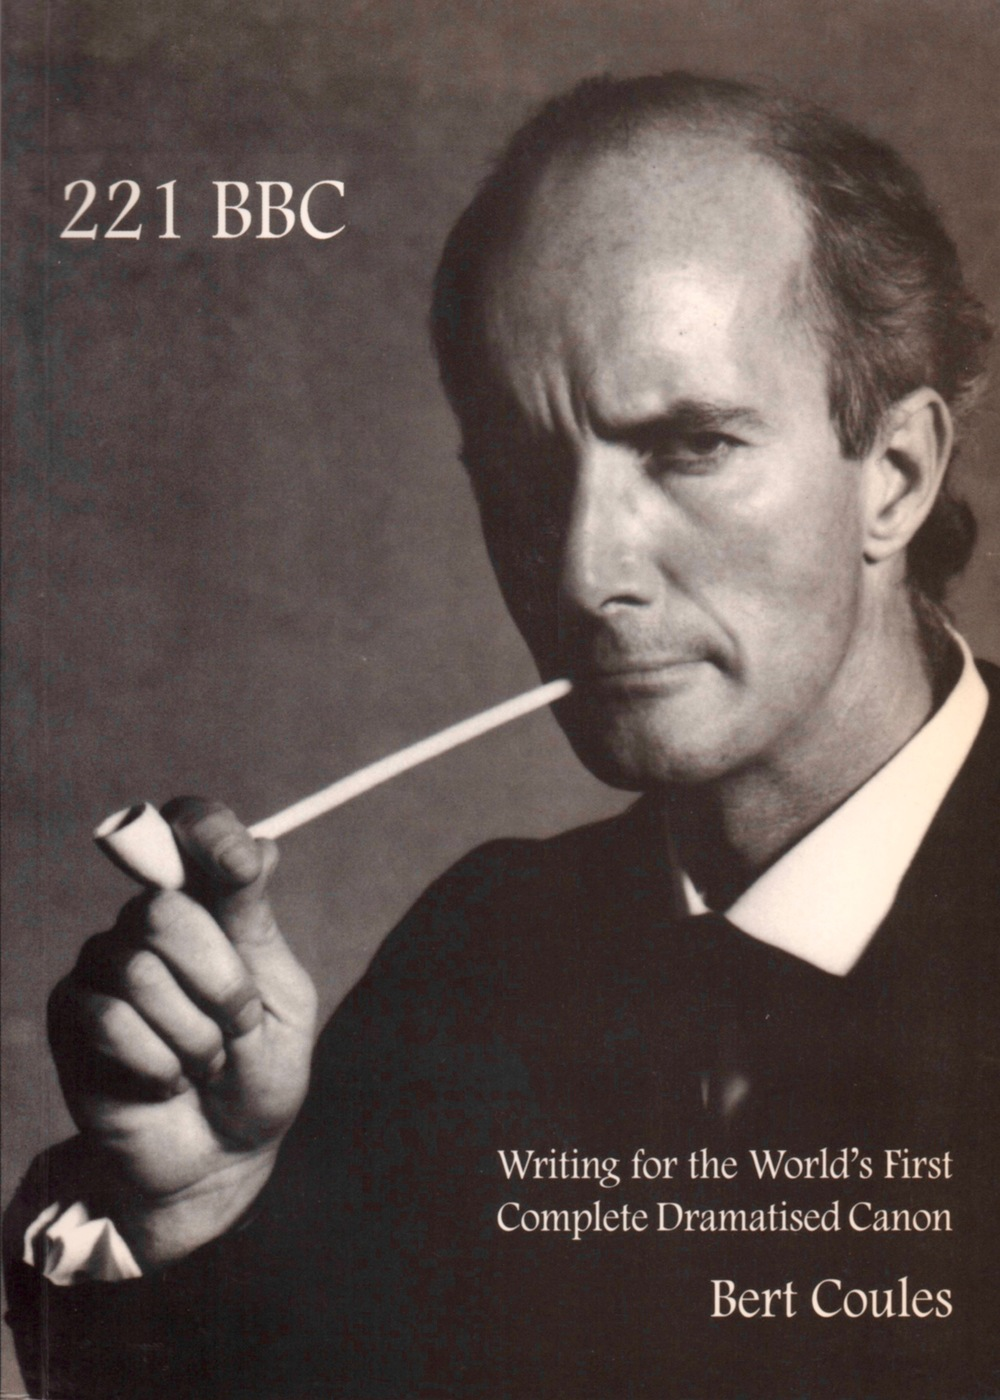 221 BBC cover.jpg